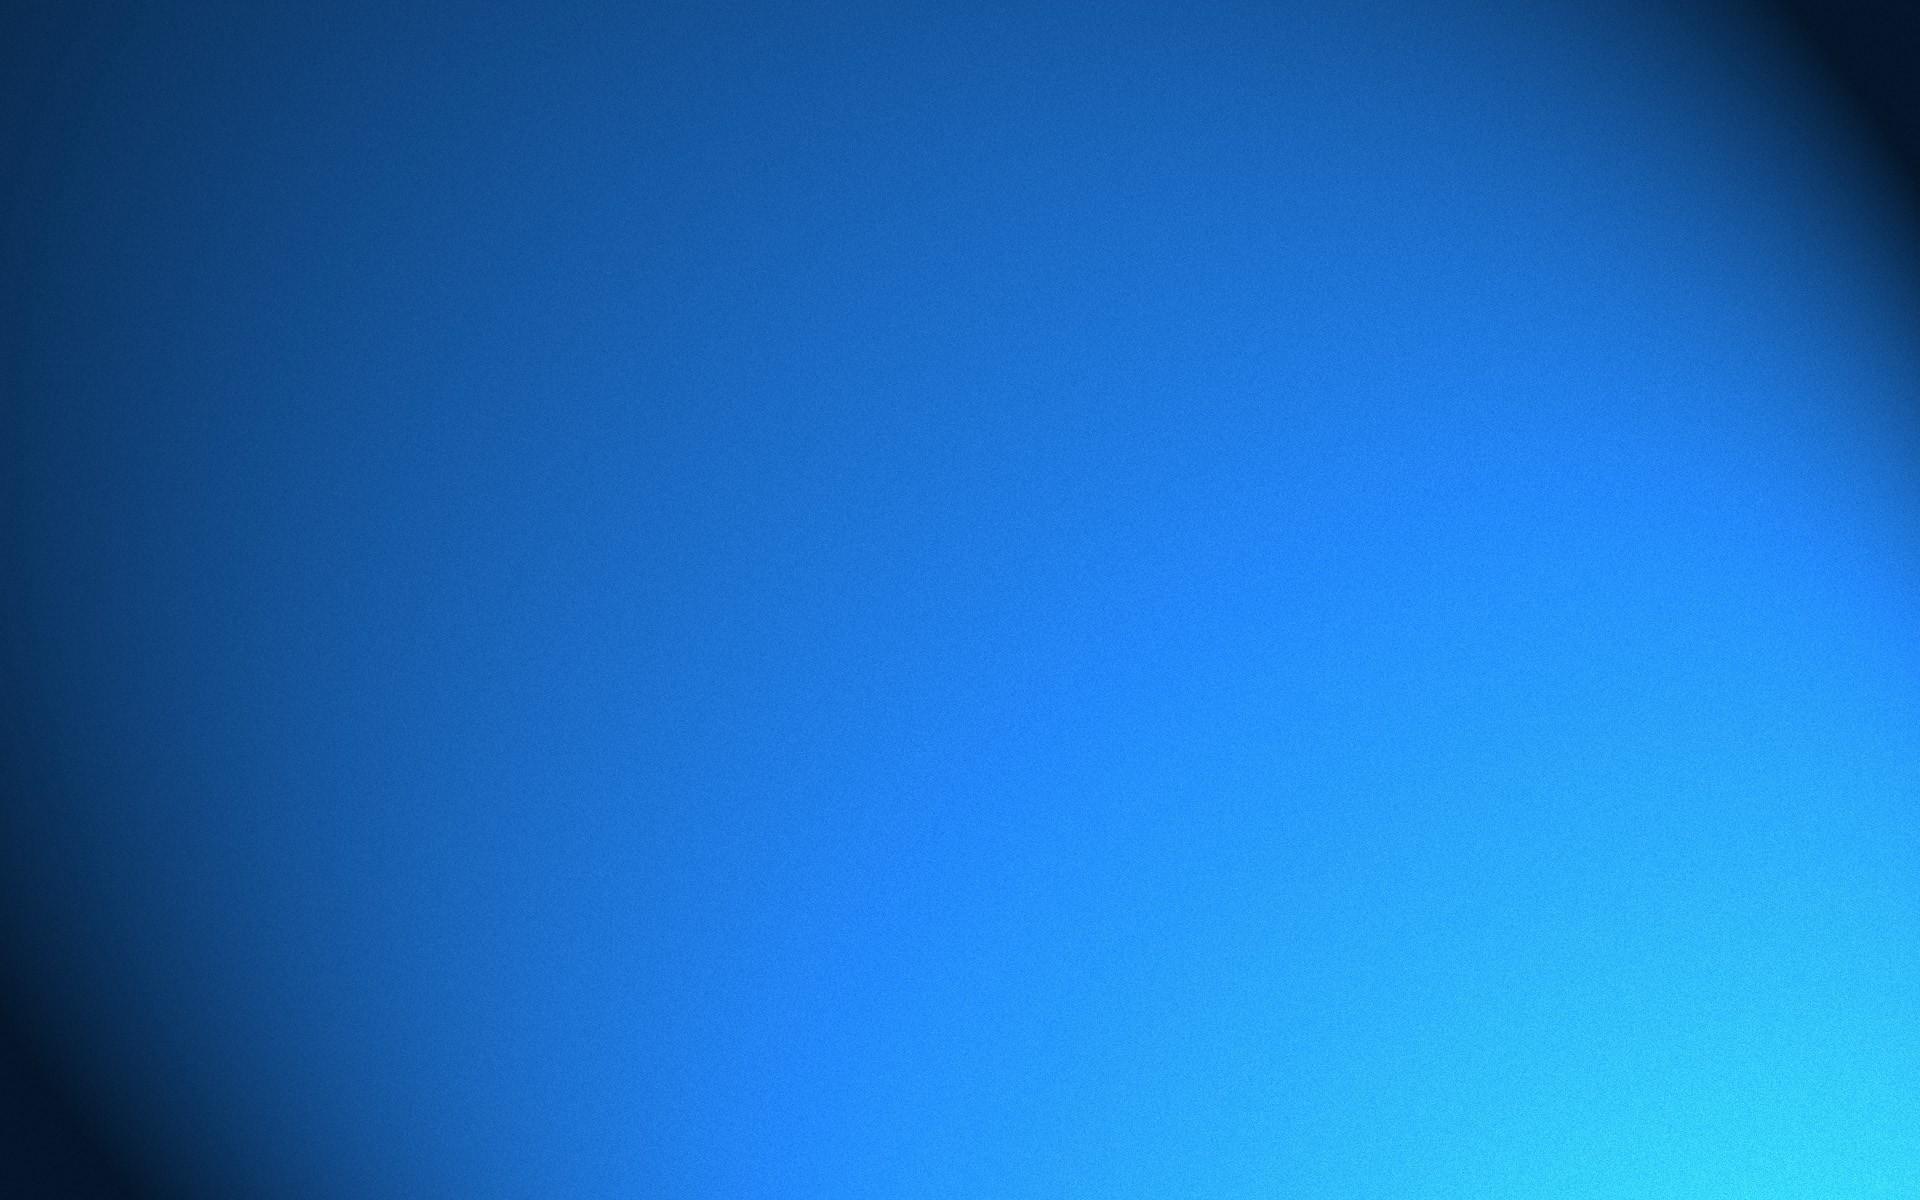 Imvu Backgrounds 183 ①